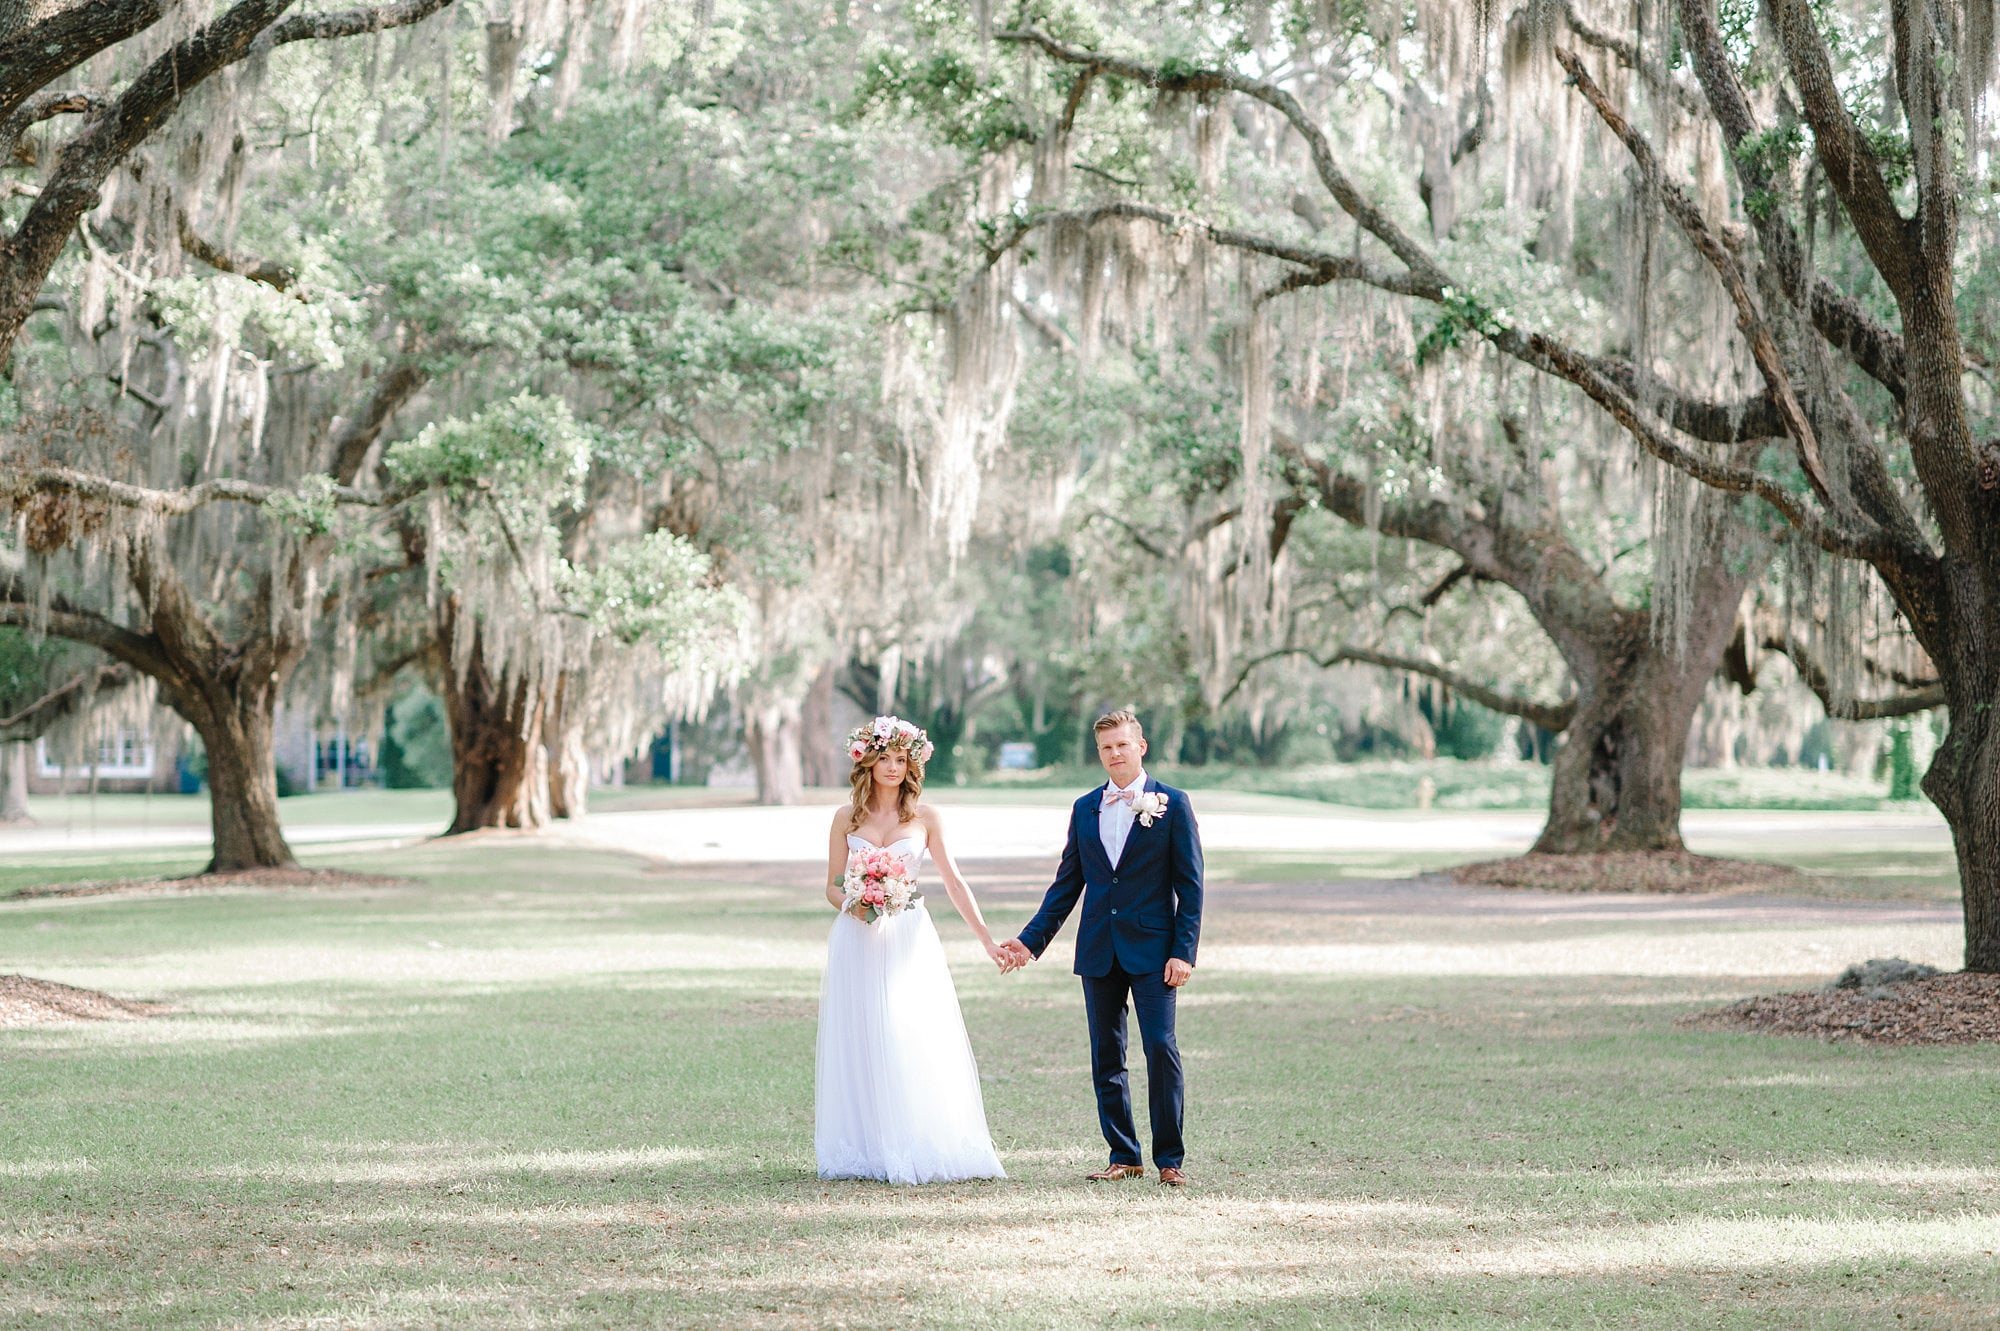 Select a Naturally Beautiful Wedding Spot